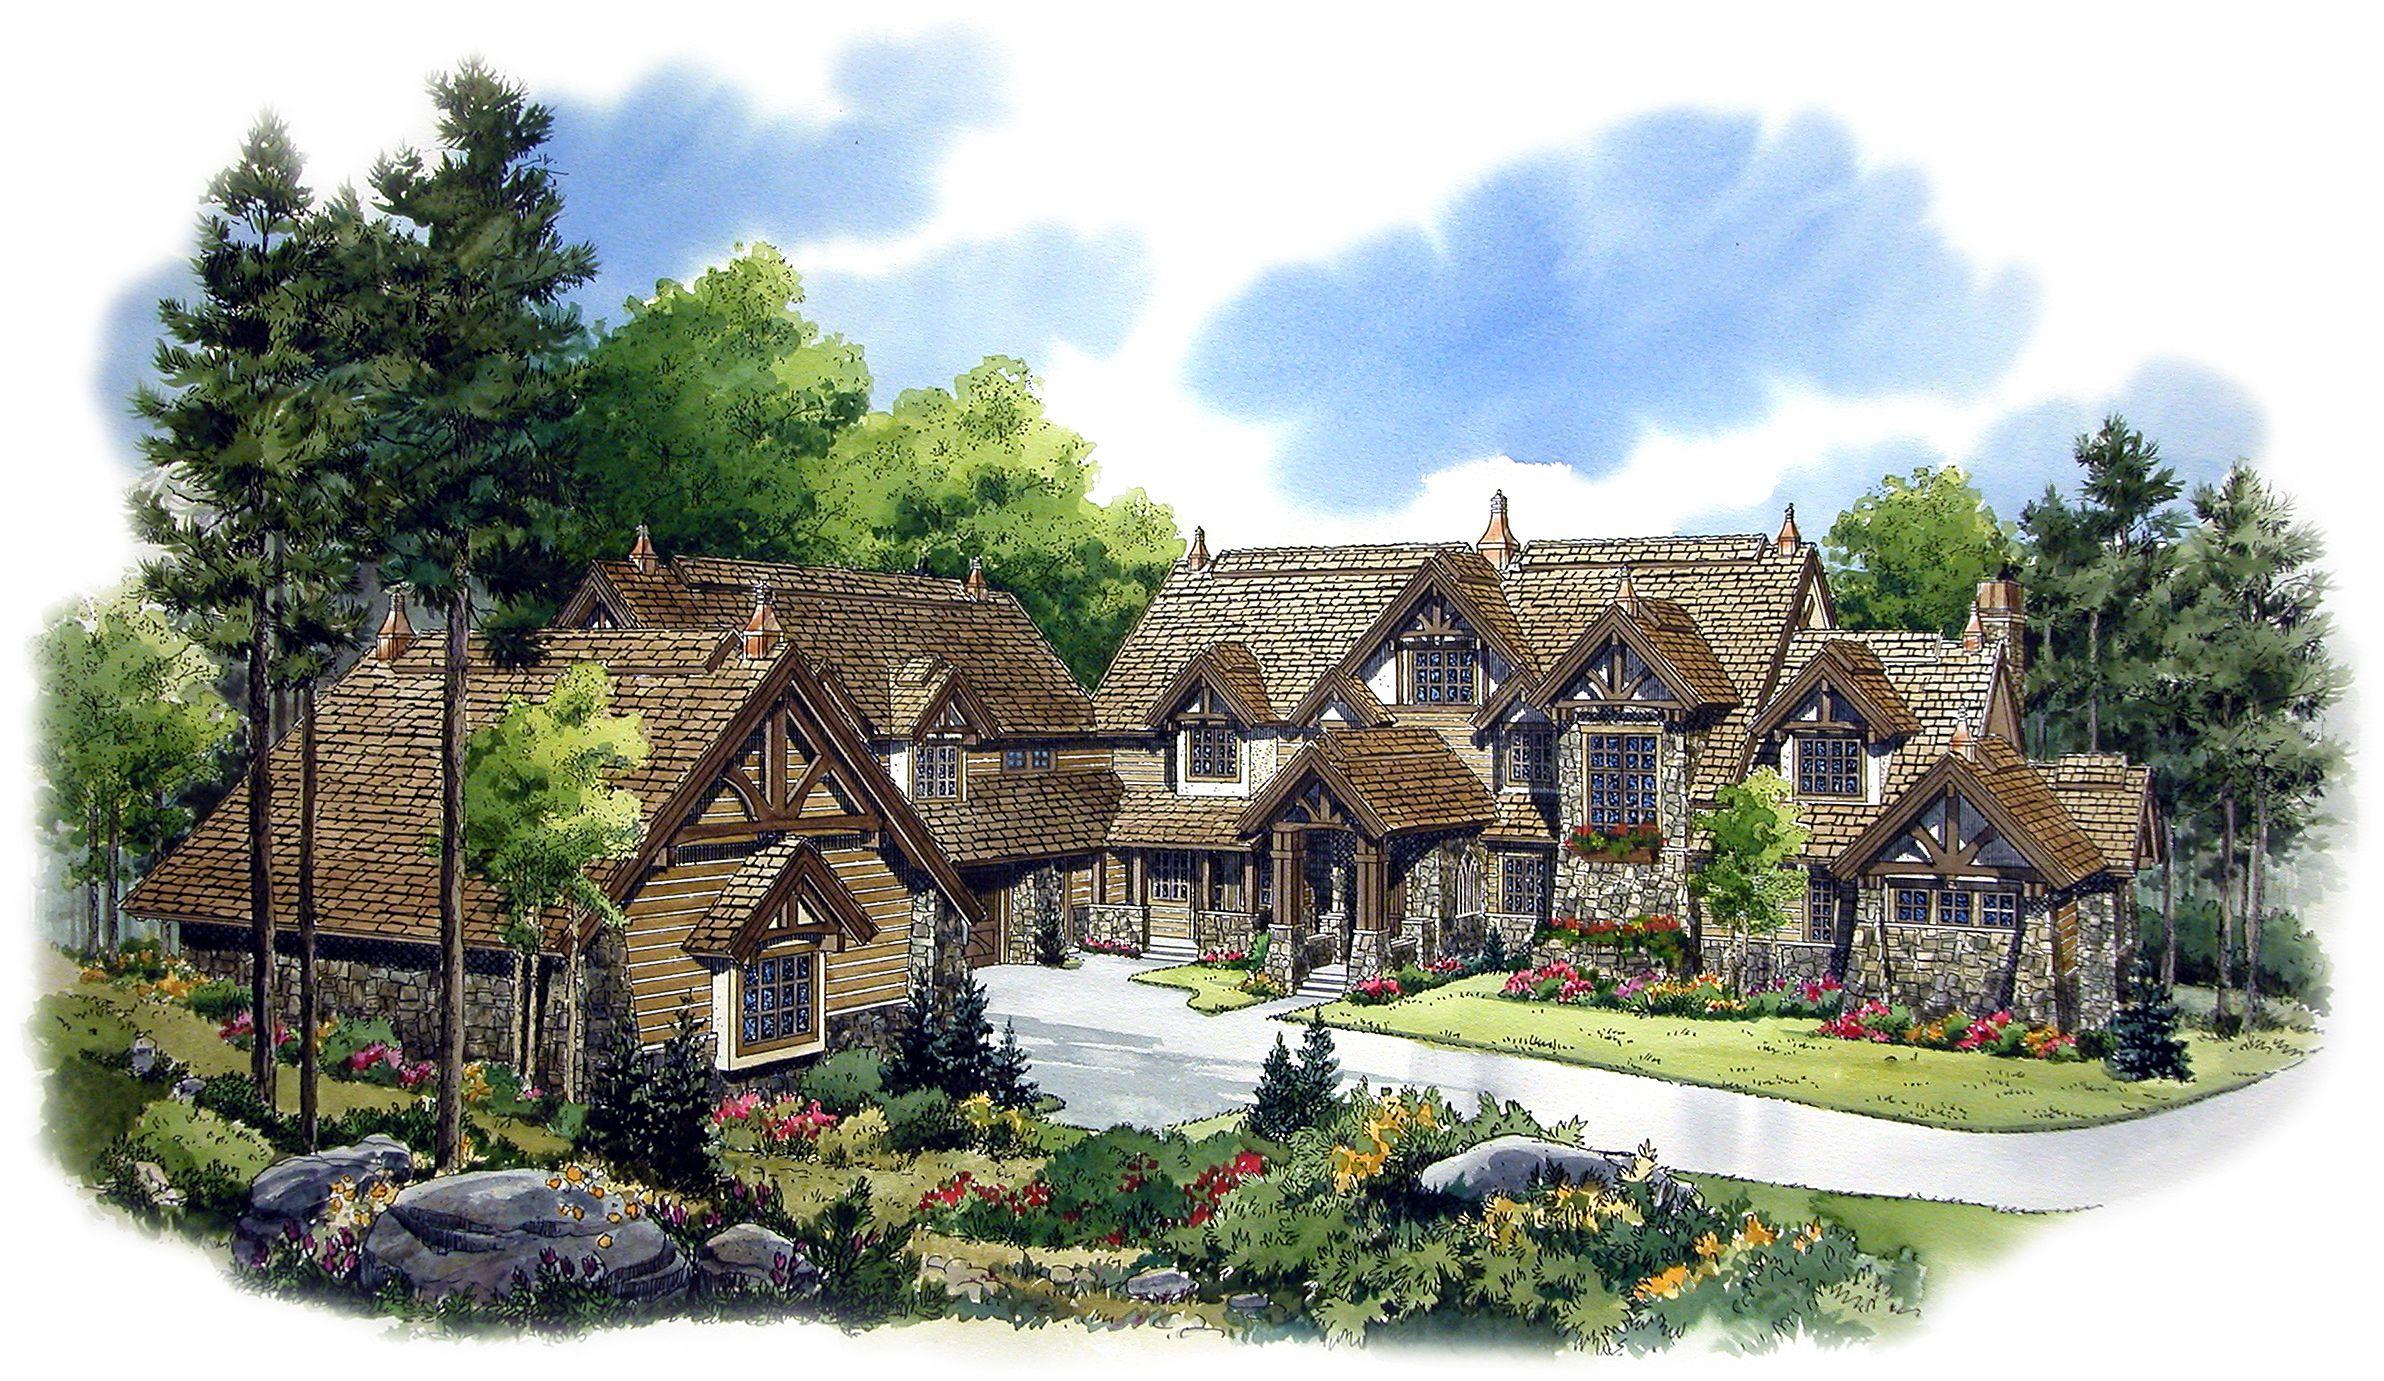 Plan 11570kn Luxurious Mountain Lodge House Plans Craftsman House Plans Southern Living House Plans